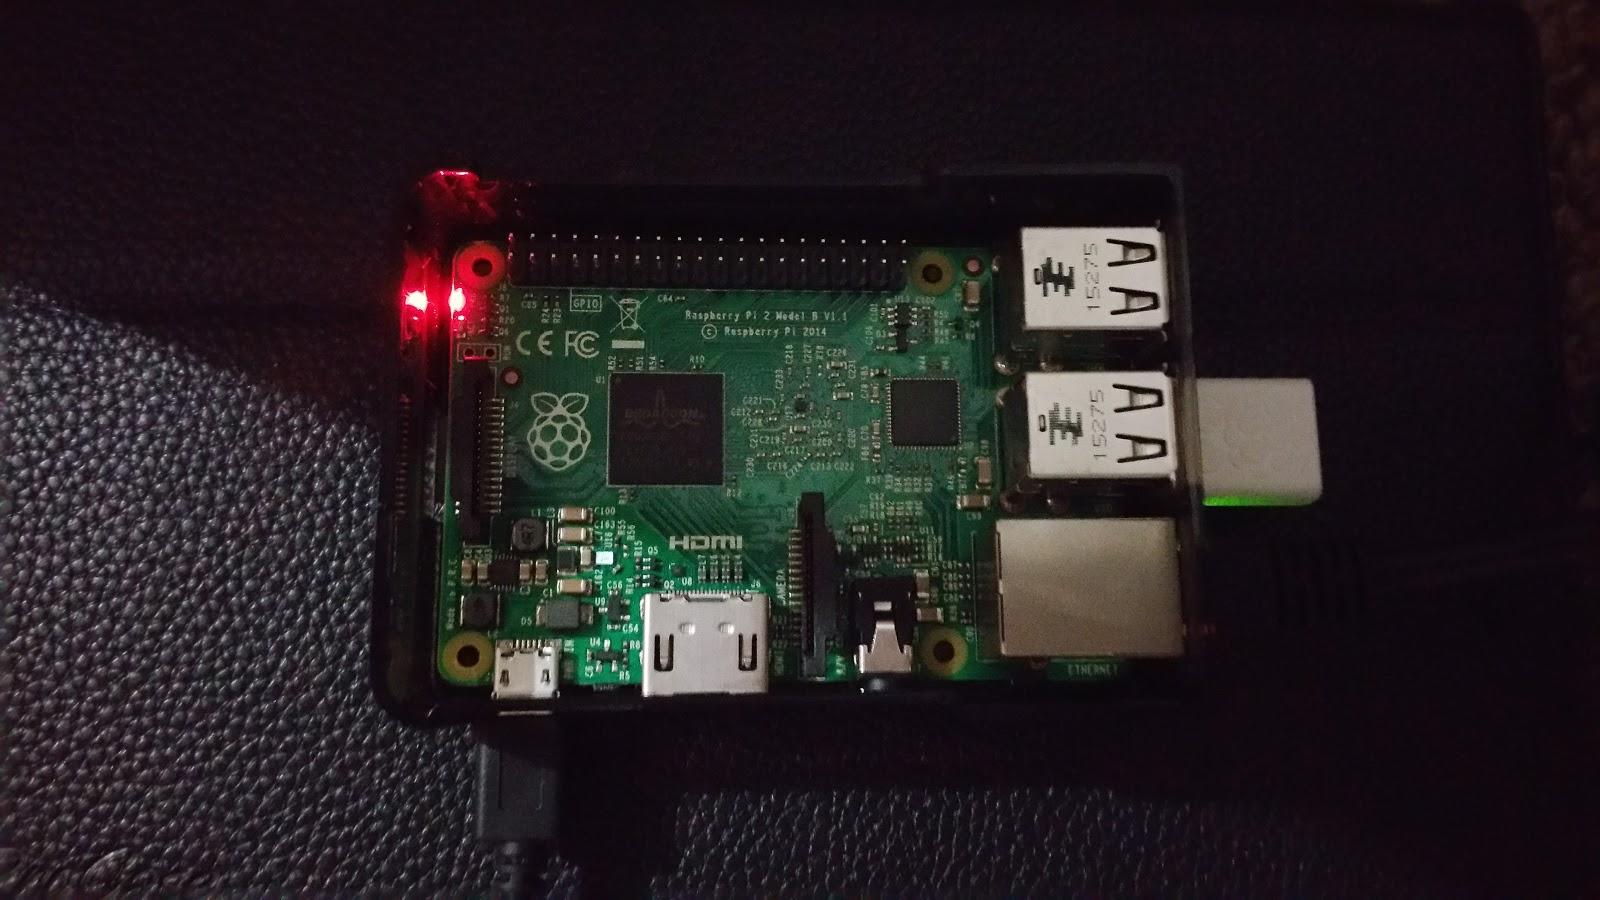 Windows 10 IoT Core on Raspberry Pi 2 - Microsoft Dynamics